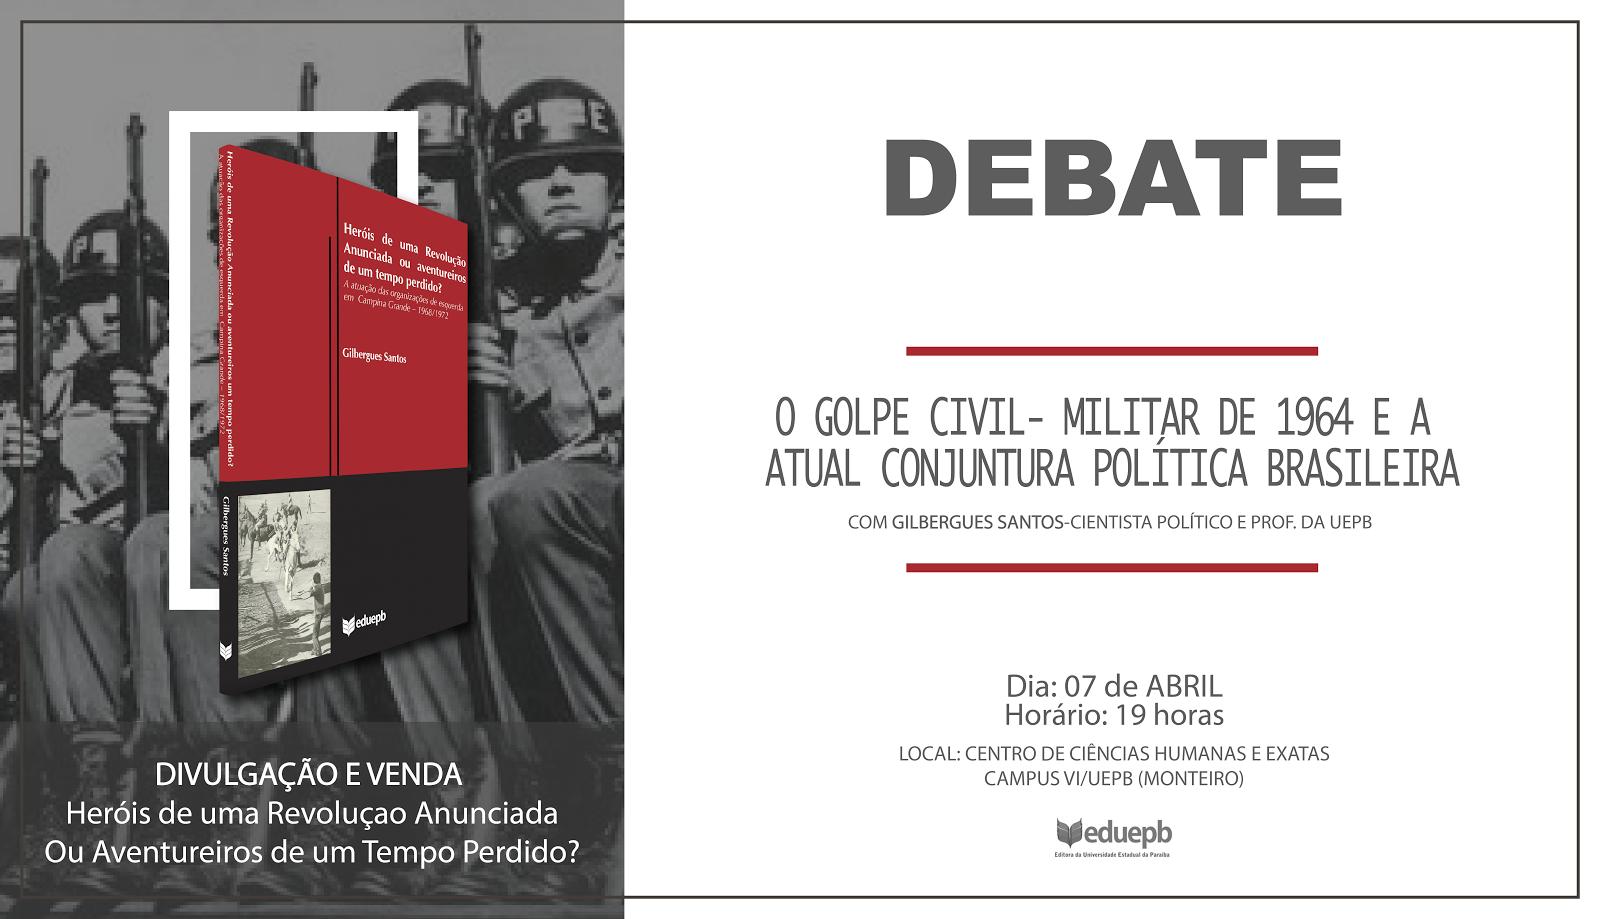 O GOLPE CIVIL-MILITAR DE 1964 E A ATUAL CONJUNTURA BRASILEIRA.